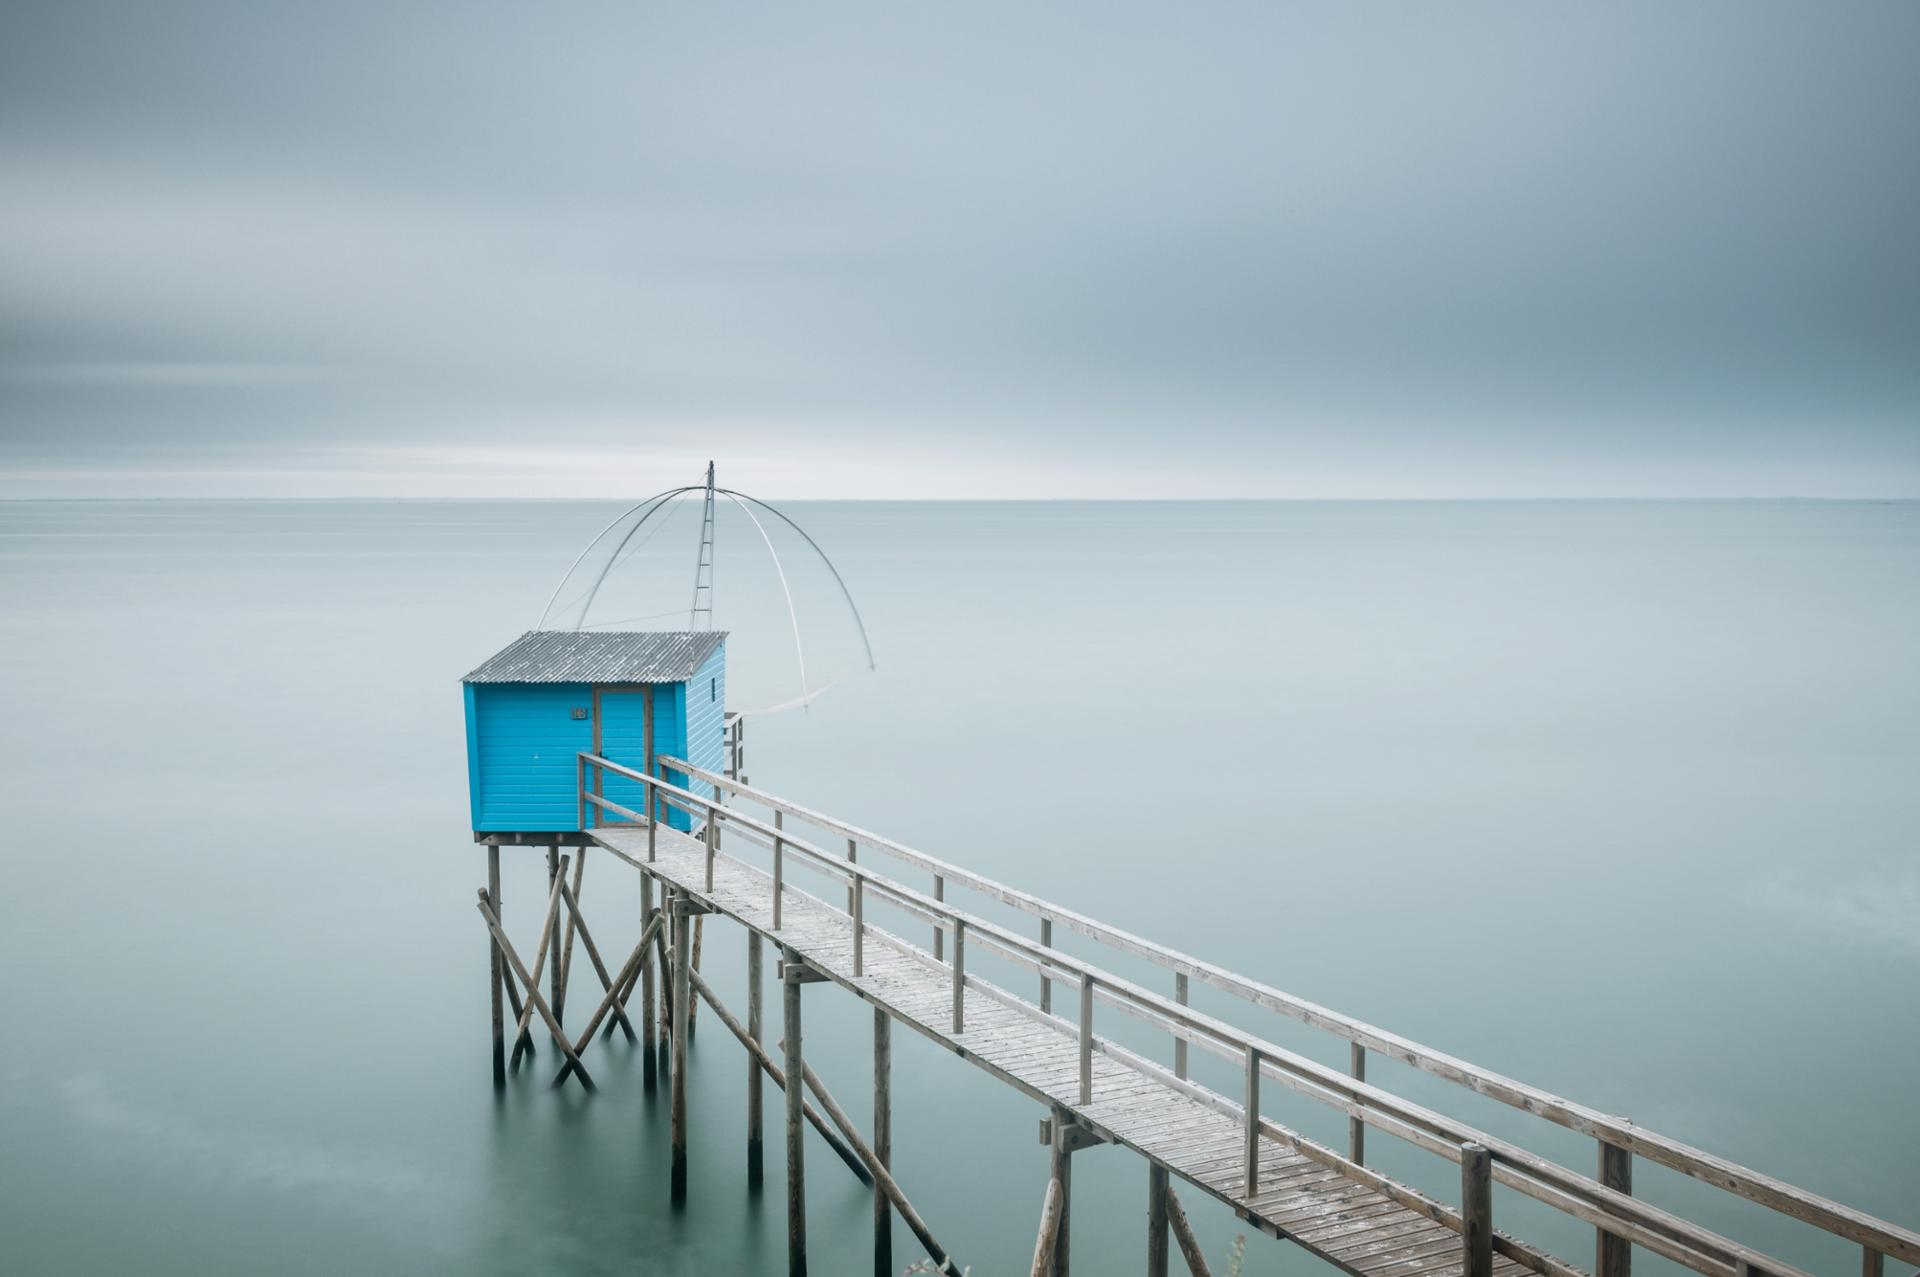 Blue fishery